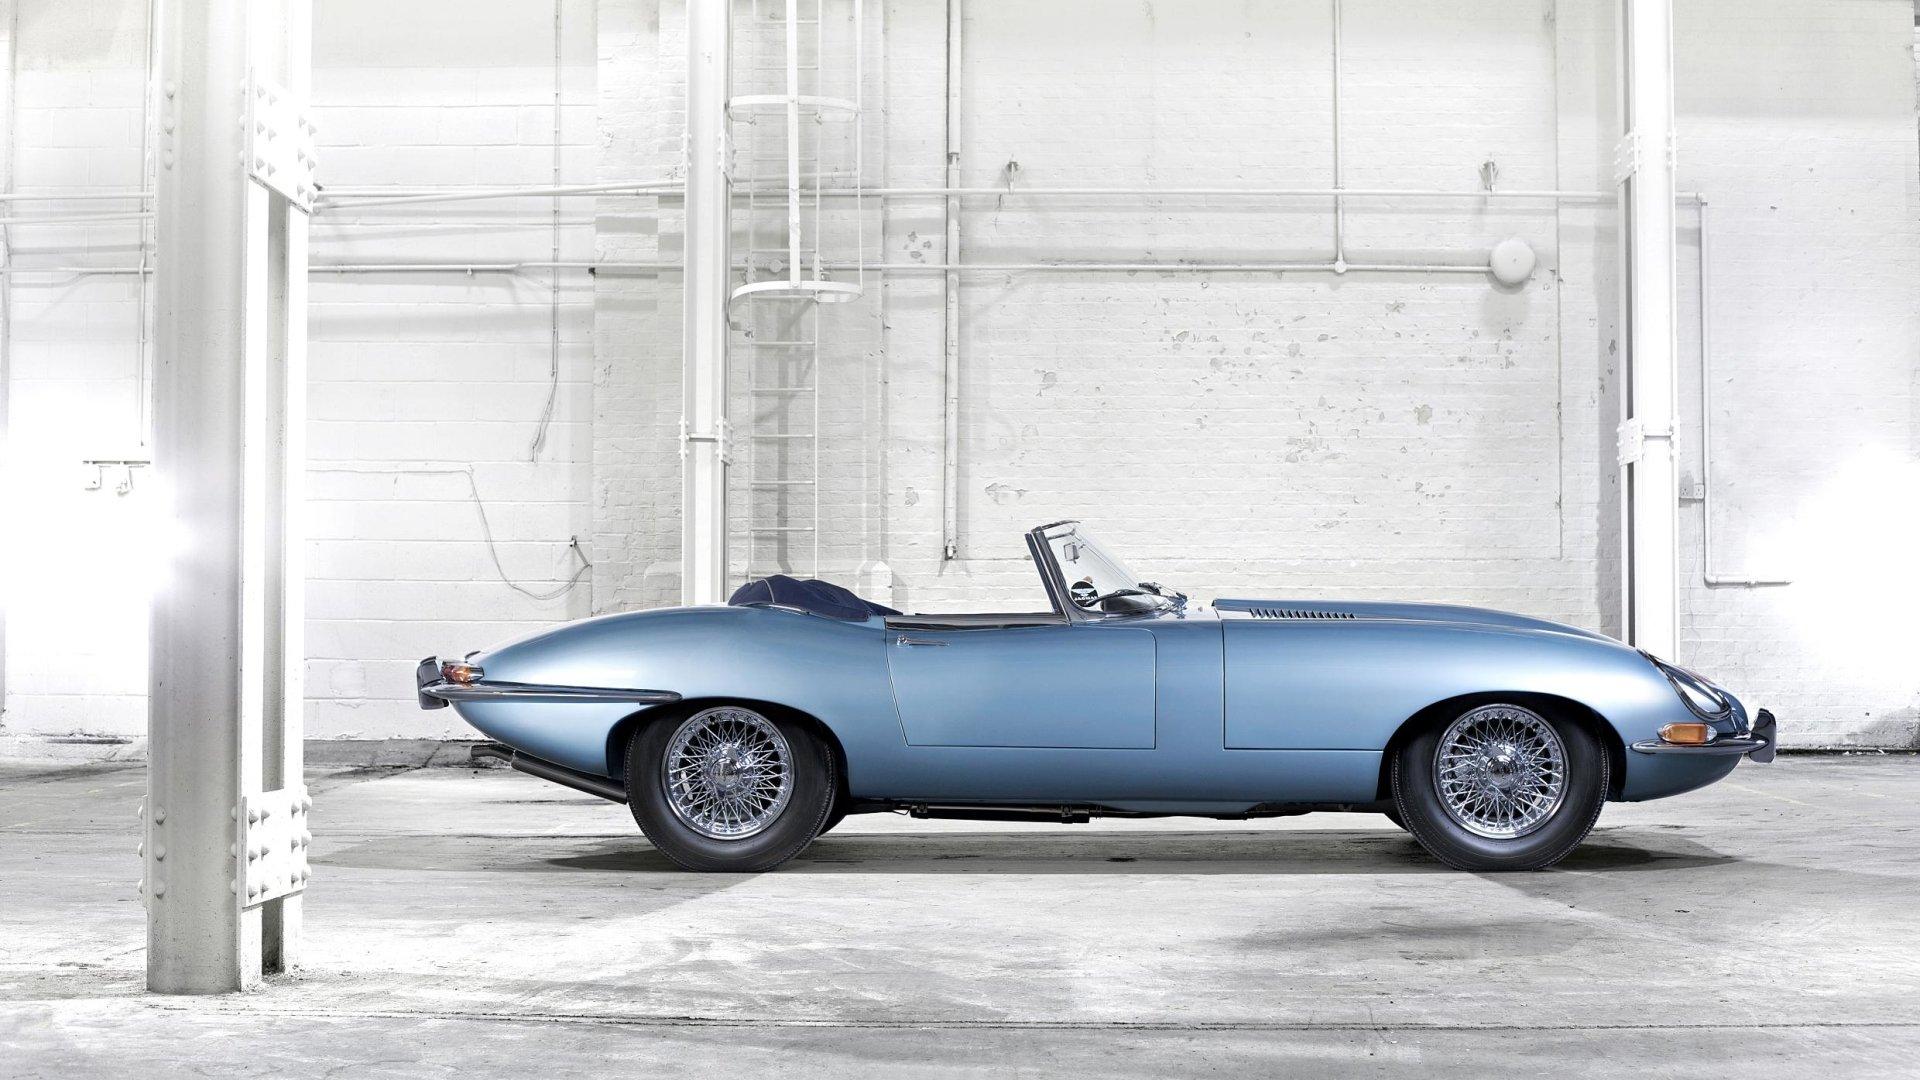 Best Jaguar Car Wallpaper Id 398065 For High Resolution Hd 1080p